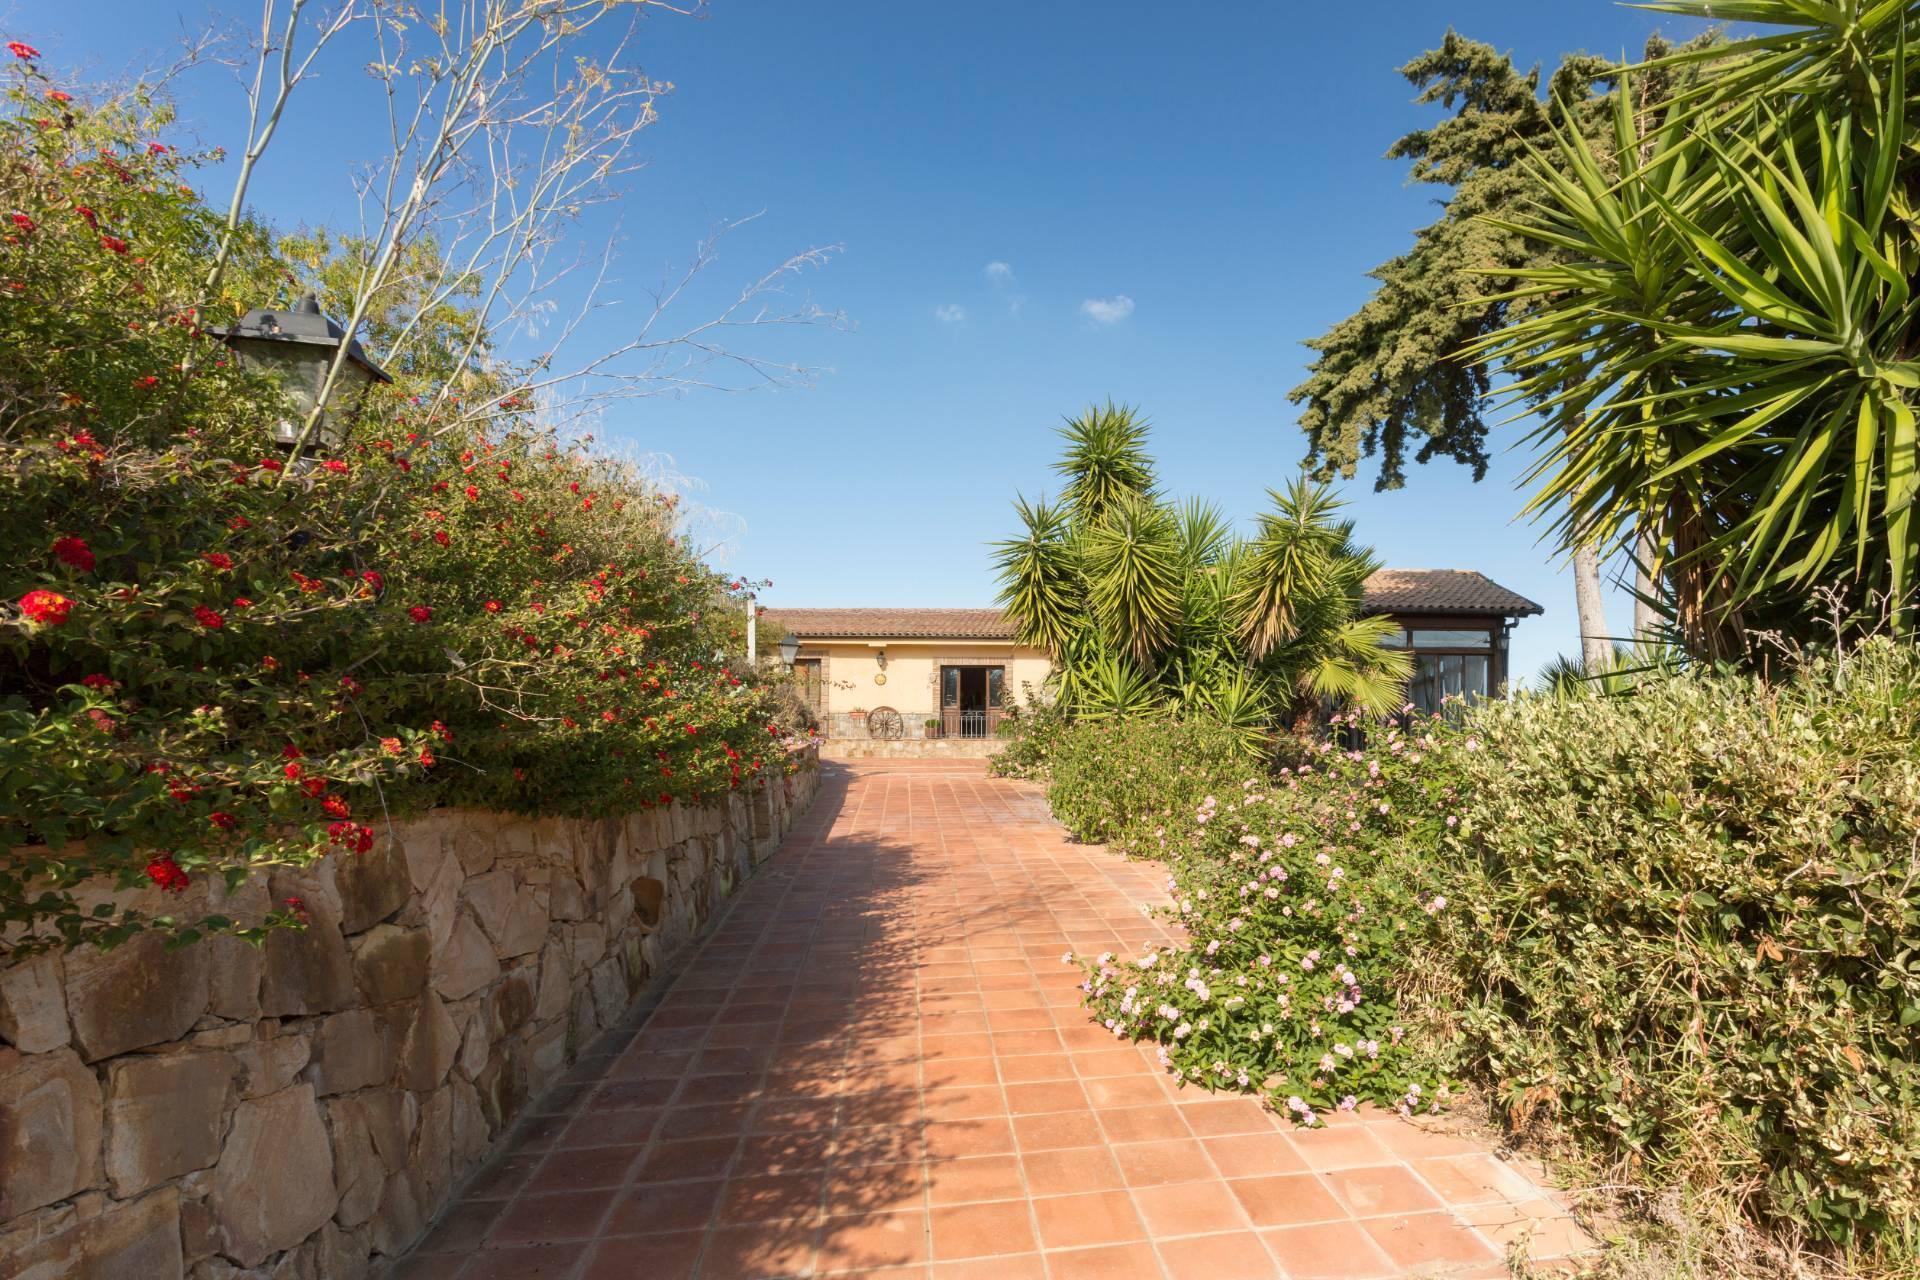 Farmhouse in the heart of Sicily - 16